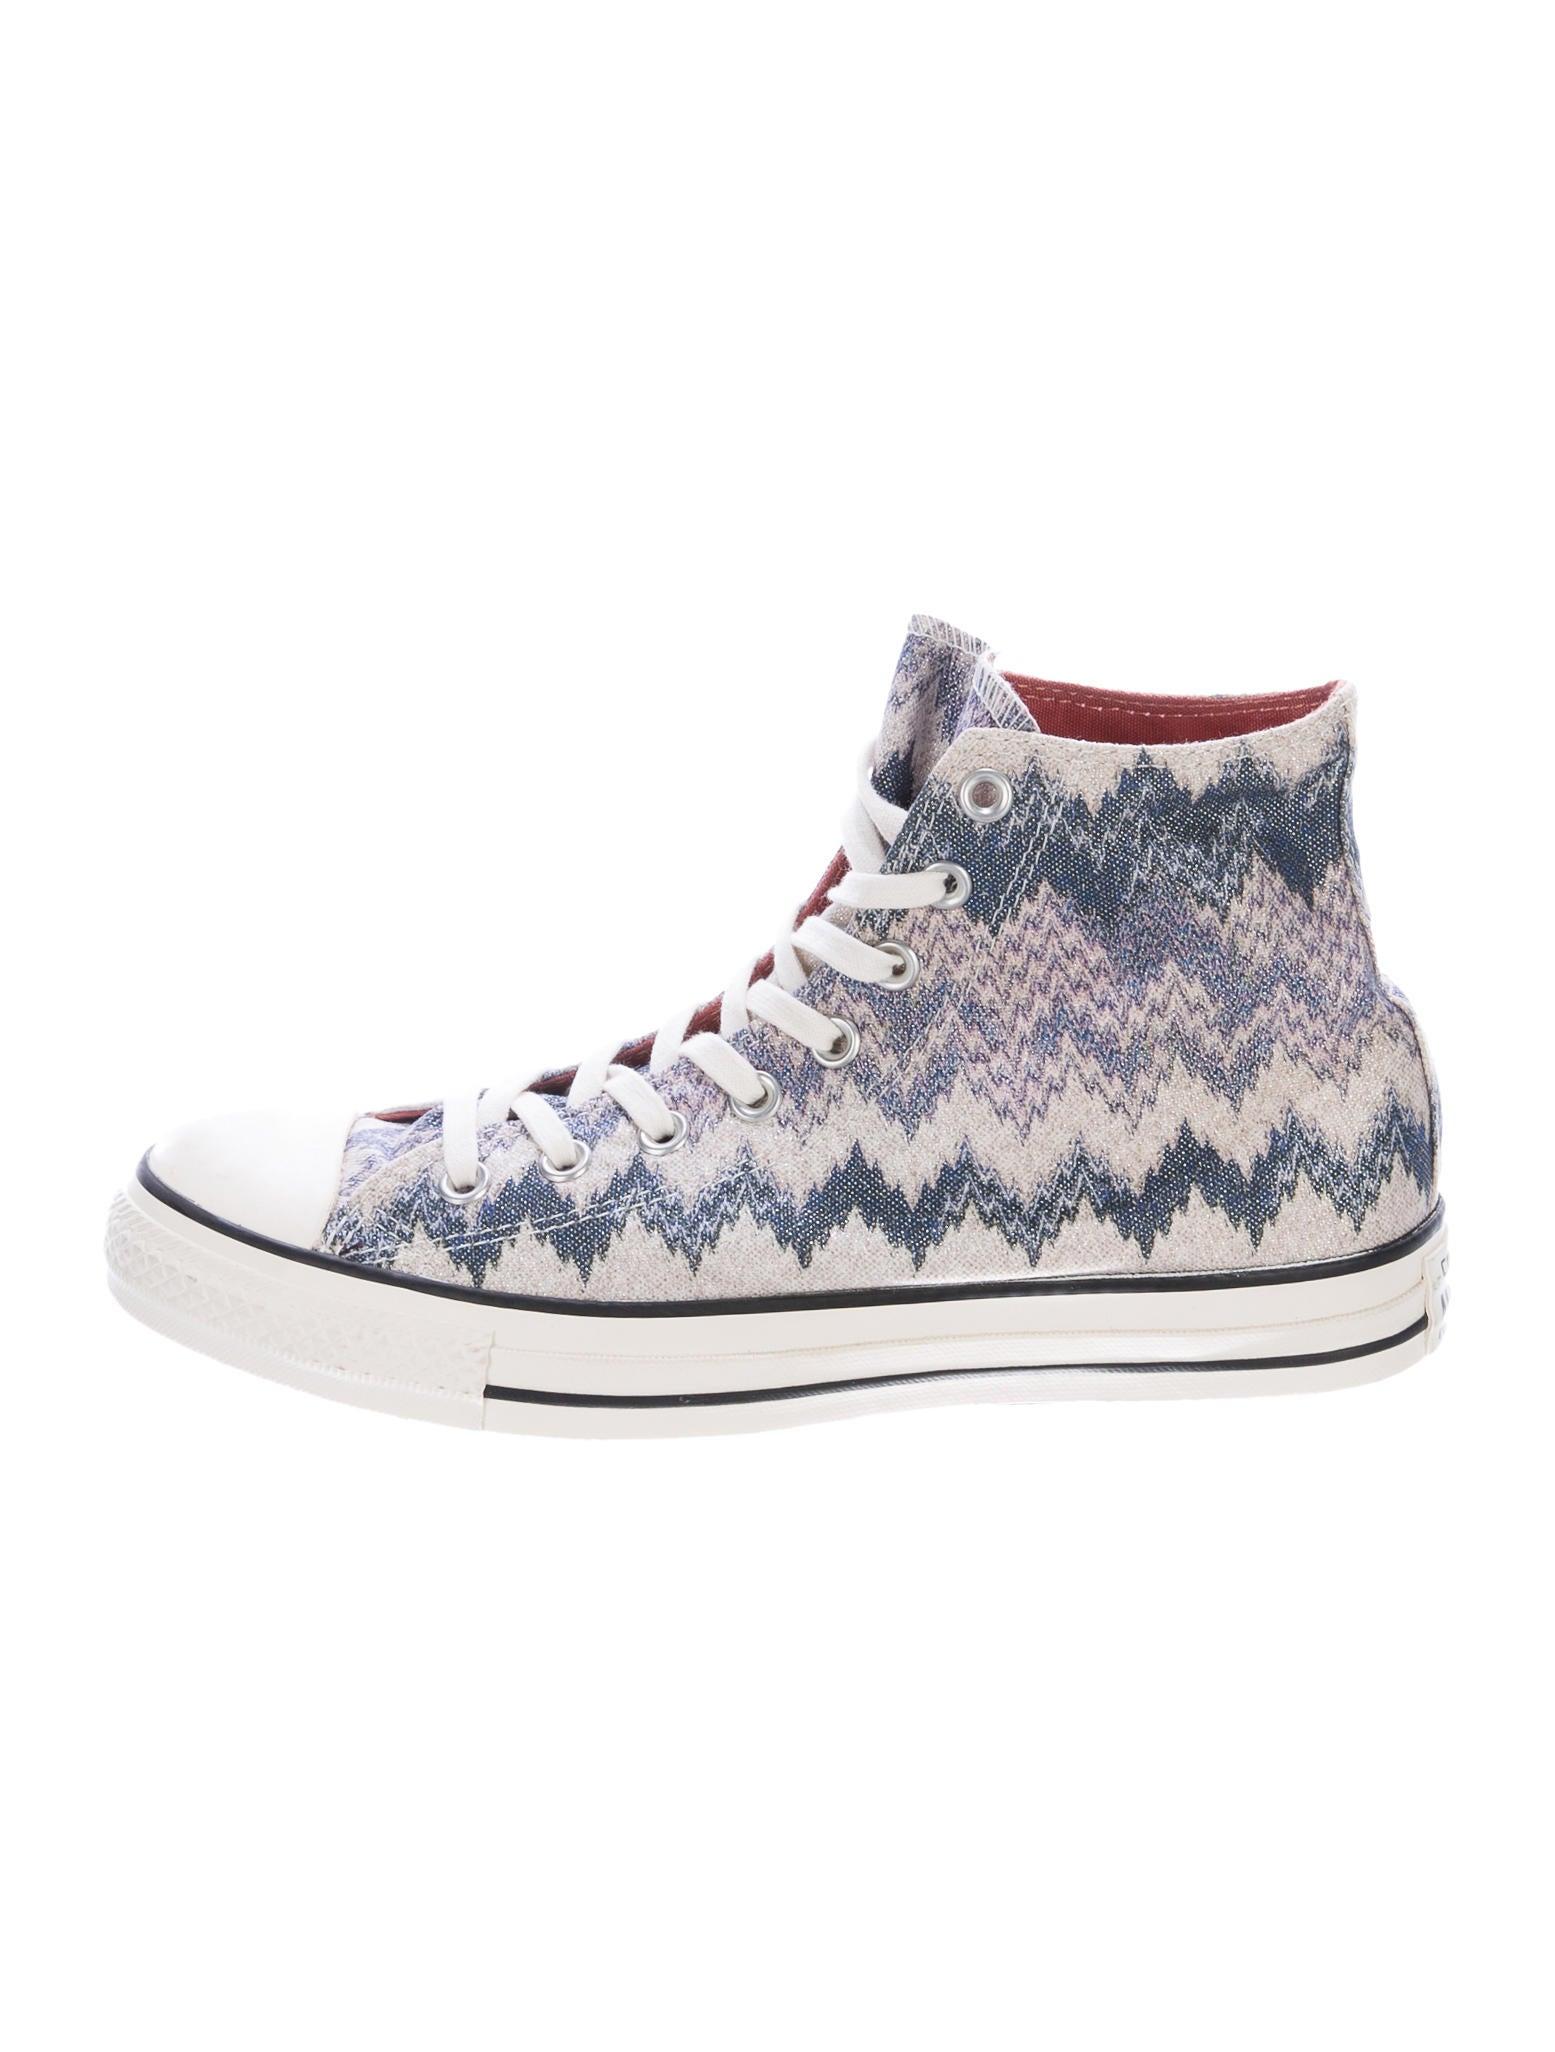 missoni x converse chevron high top sneakers shoes